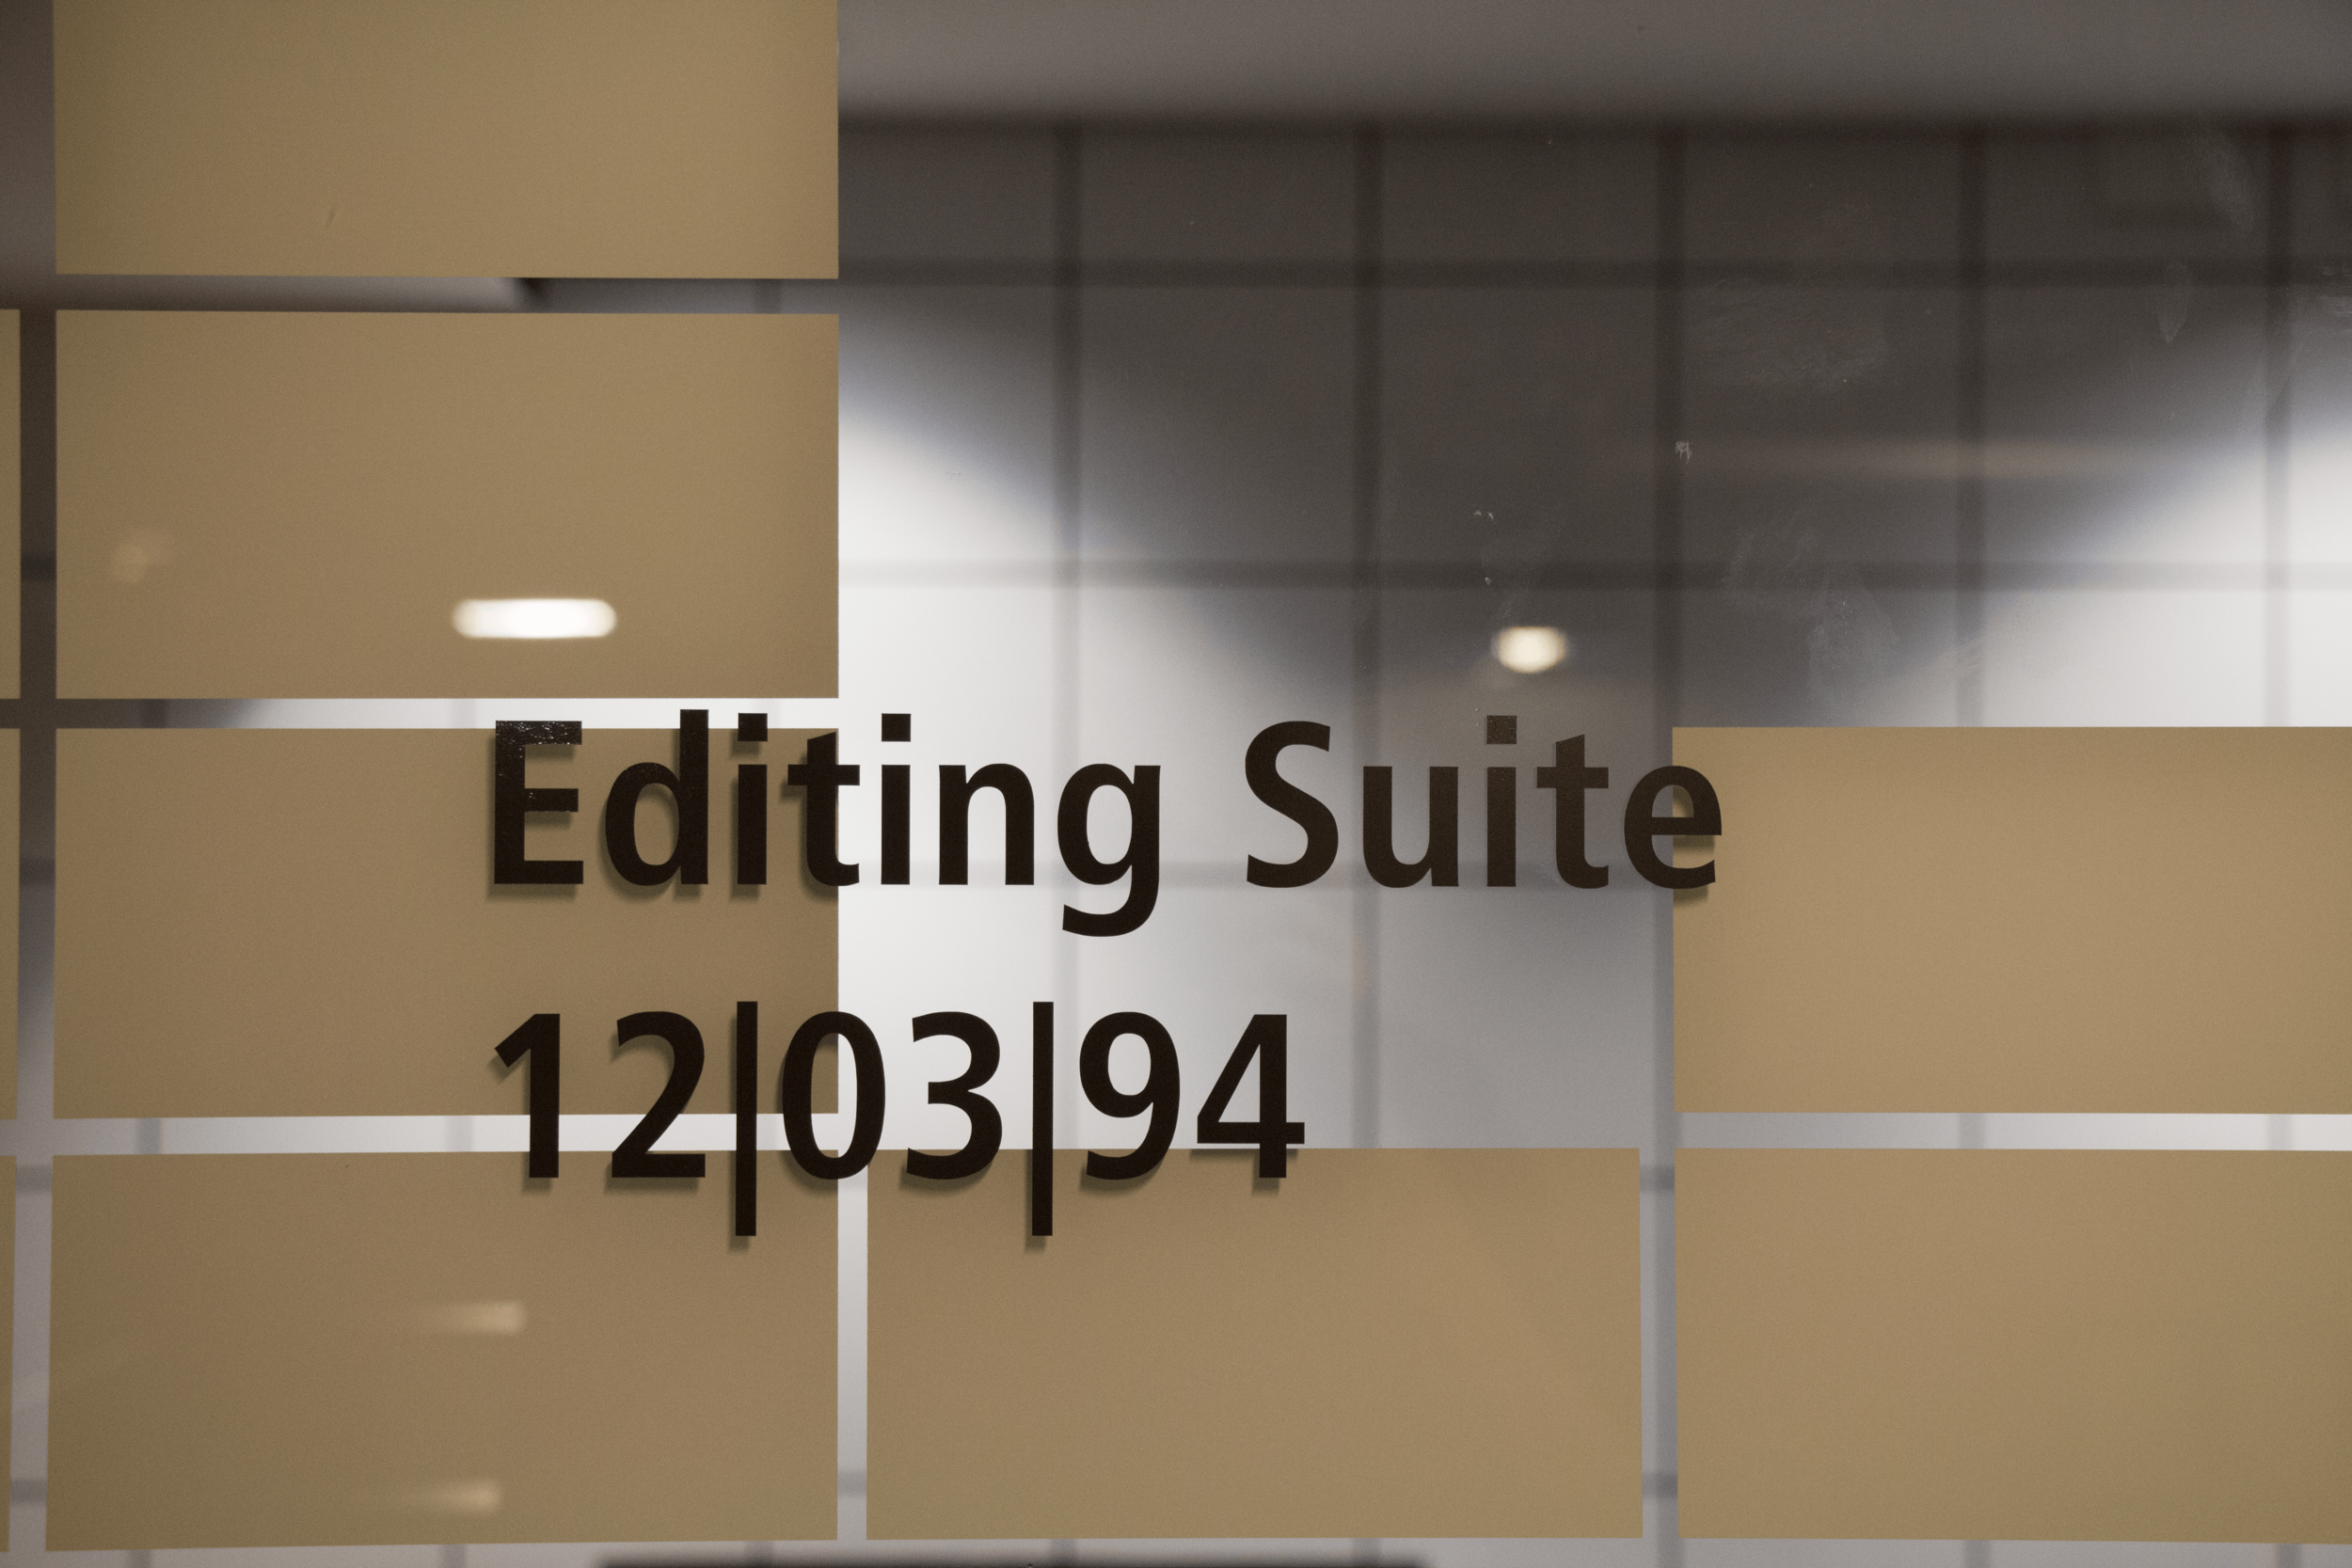 Edit Suite -